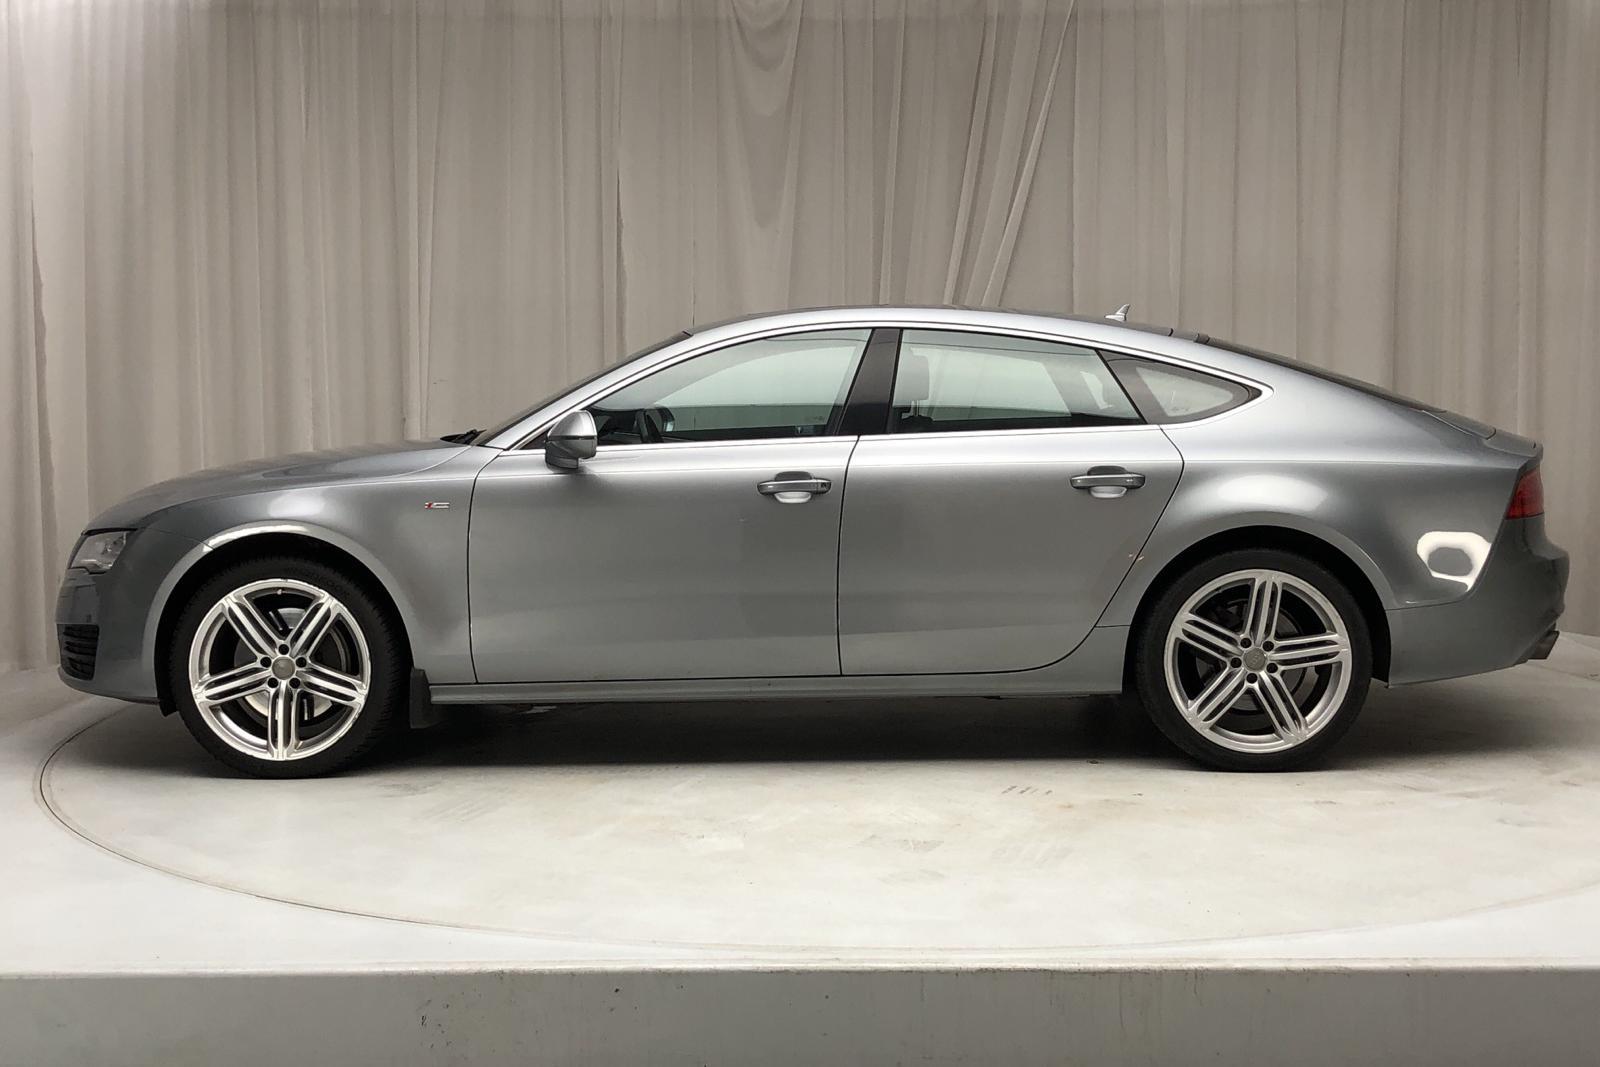 Audi A7 3.0 TFSI Sportback quattro (300hk) - 122 630 km - Automatic - gray - 2011